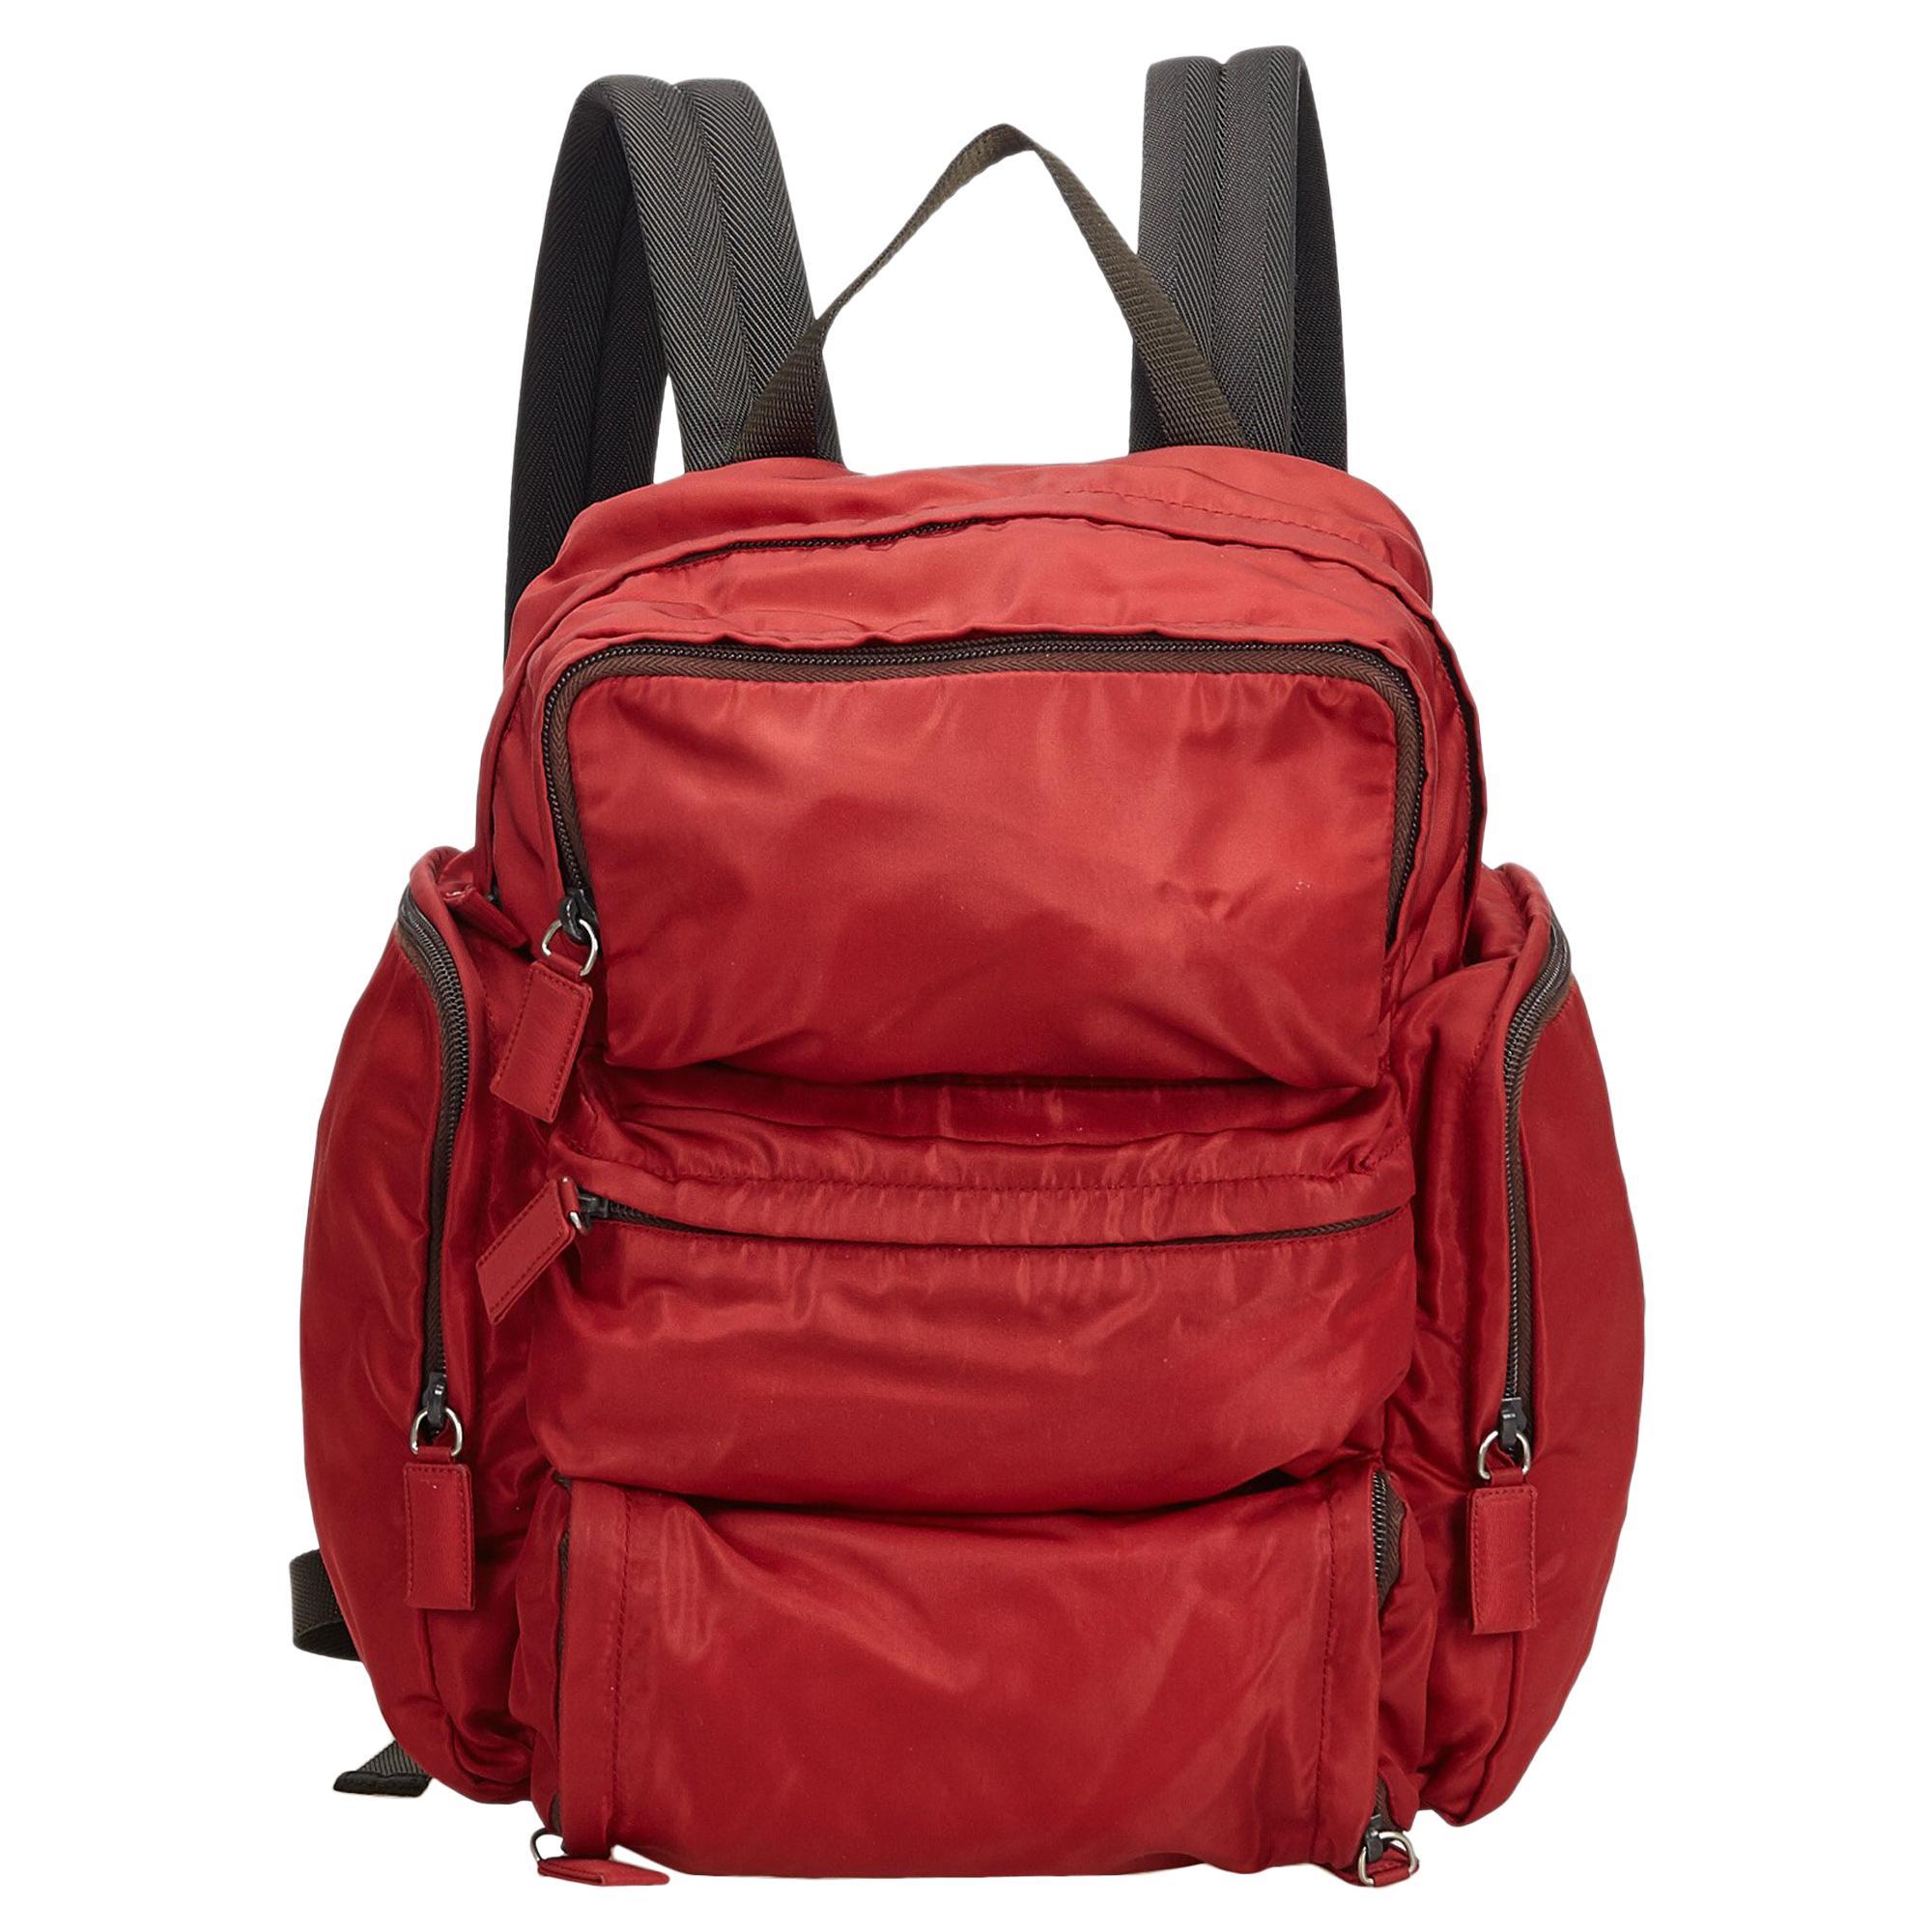 7ab177945403 Prada Black Nylon Drawstring Backpack at 1stdibs